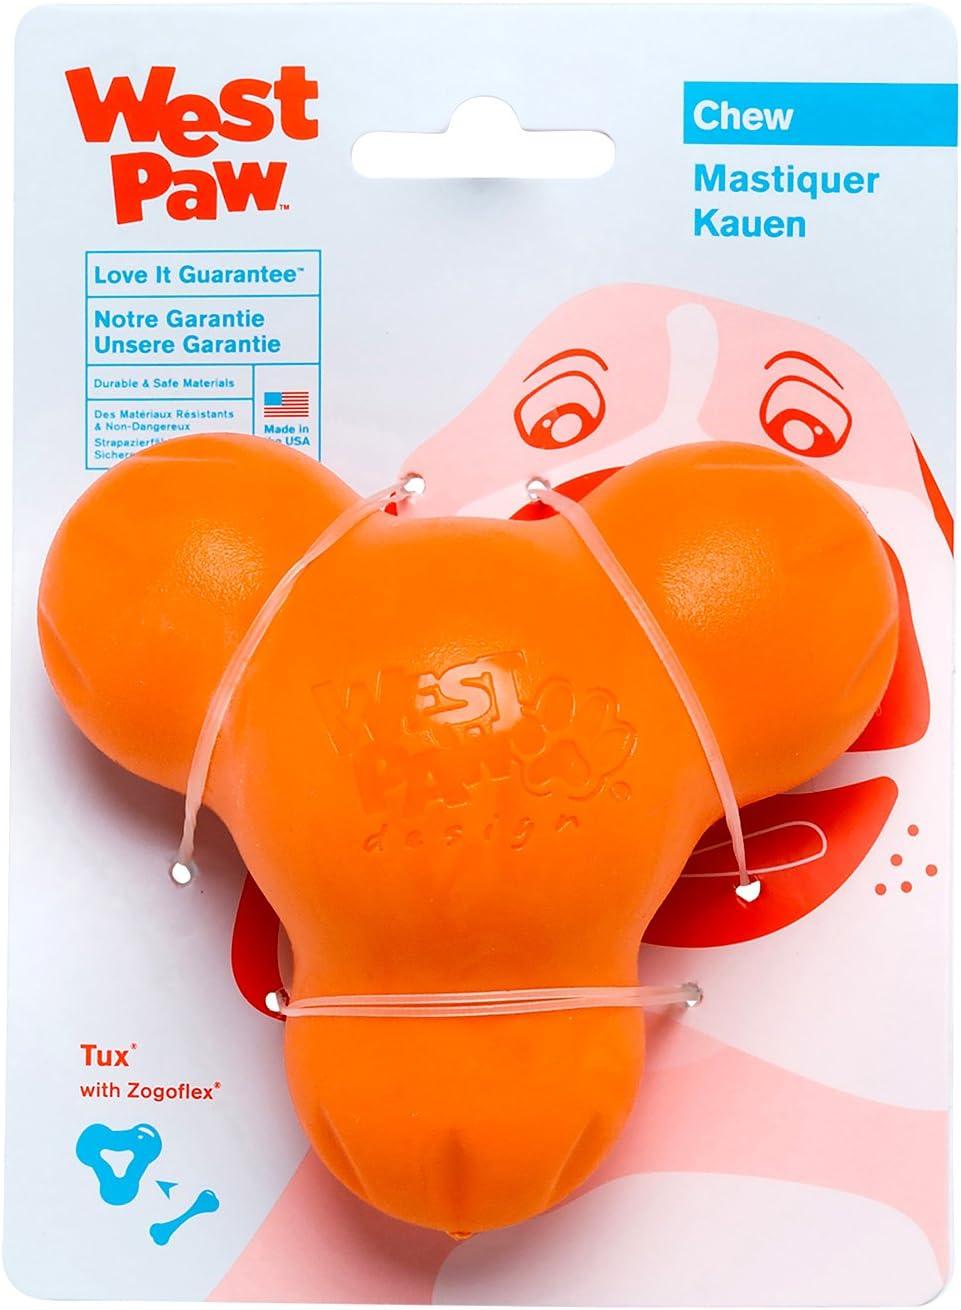 West Paw Zogoflex Tux Interactive Treat Dispensing Dog Chew Toy